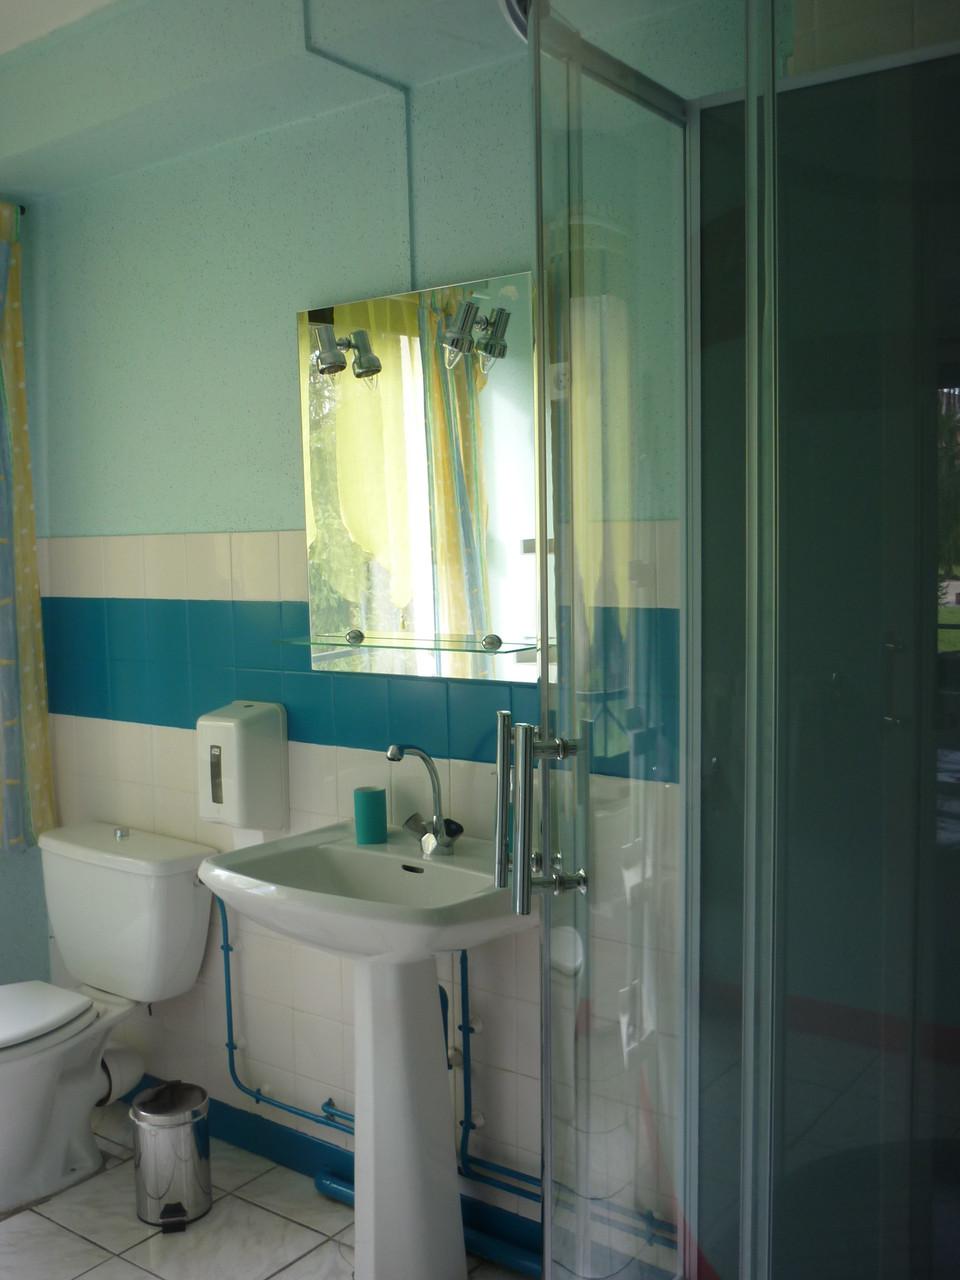 Sanitaire chambre 2 lits simples 19 m²